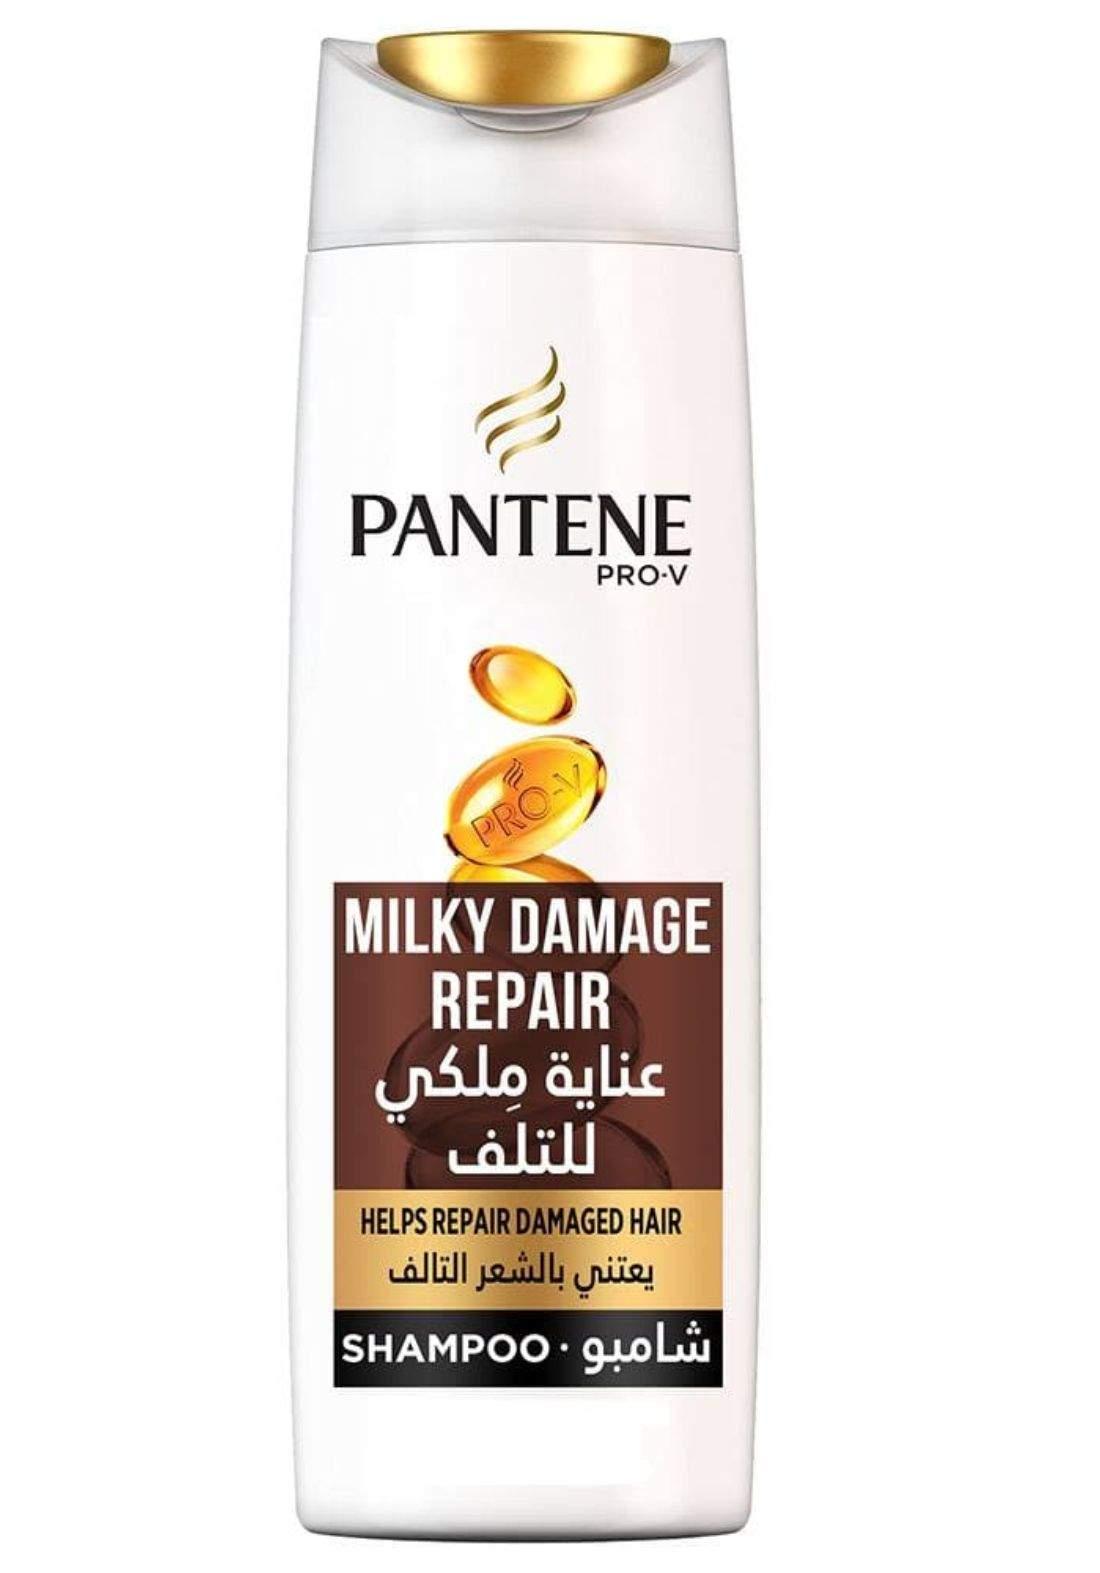 Pantene milky damage repair shampoo 400mlشامبو بانتين عناية ملكية